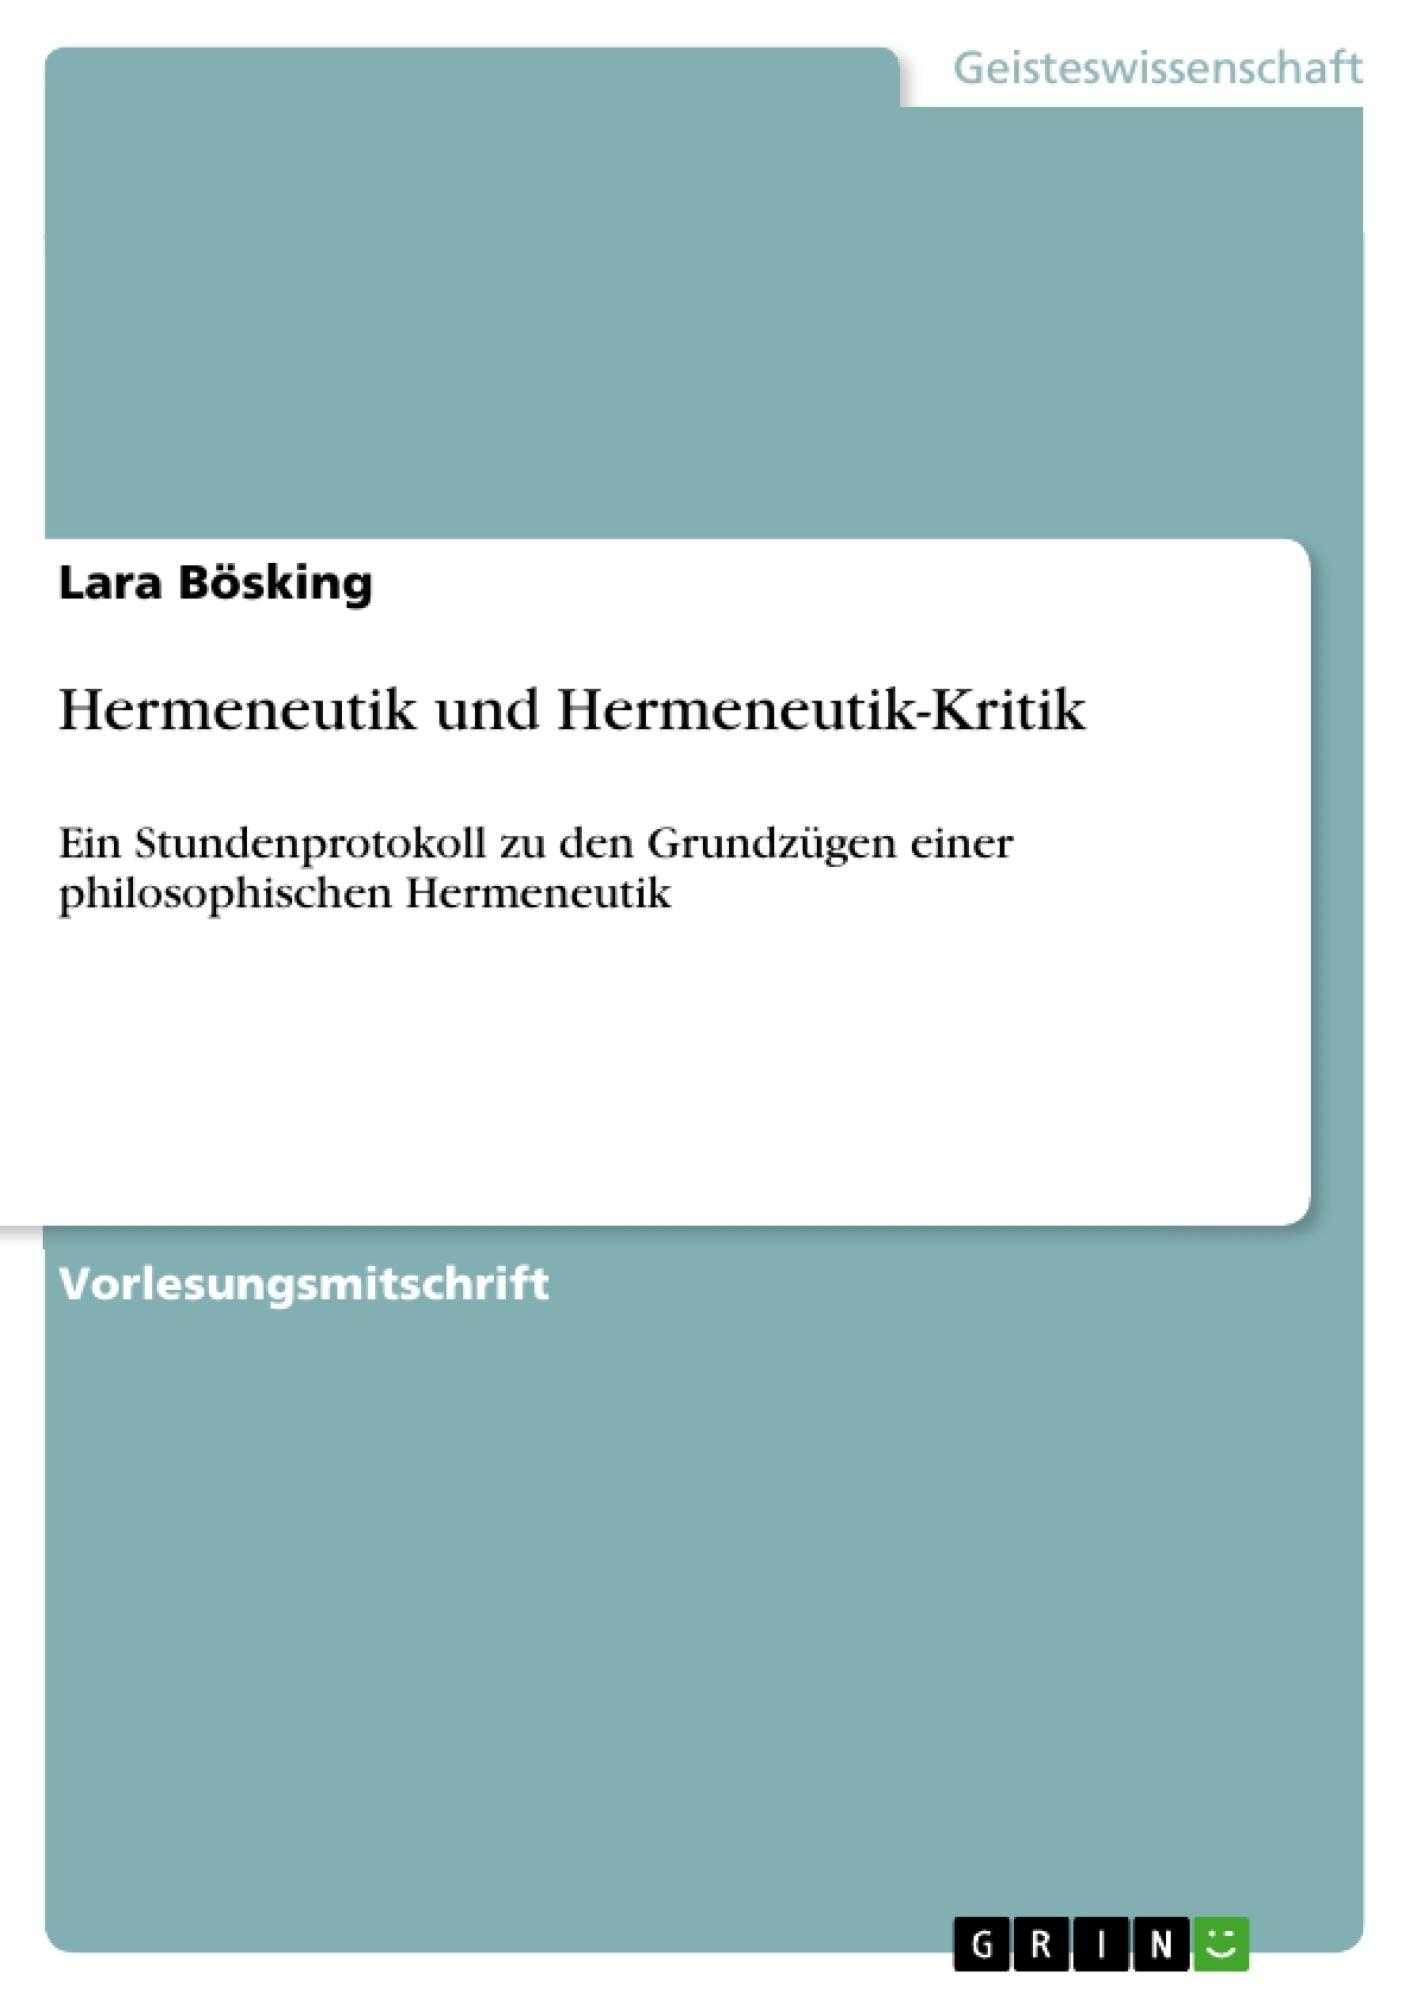 Titel: Hermeneutik und Hermeneutik-Kritik